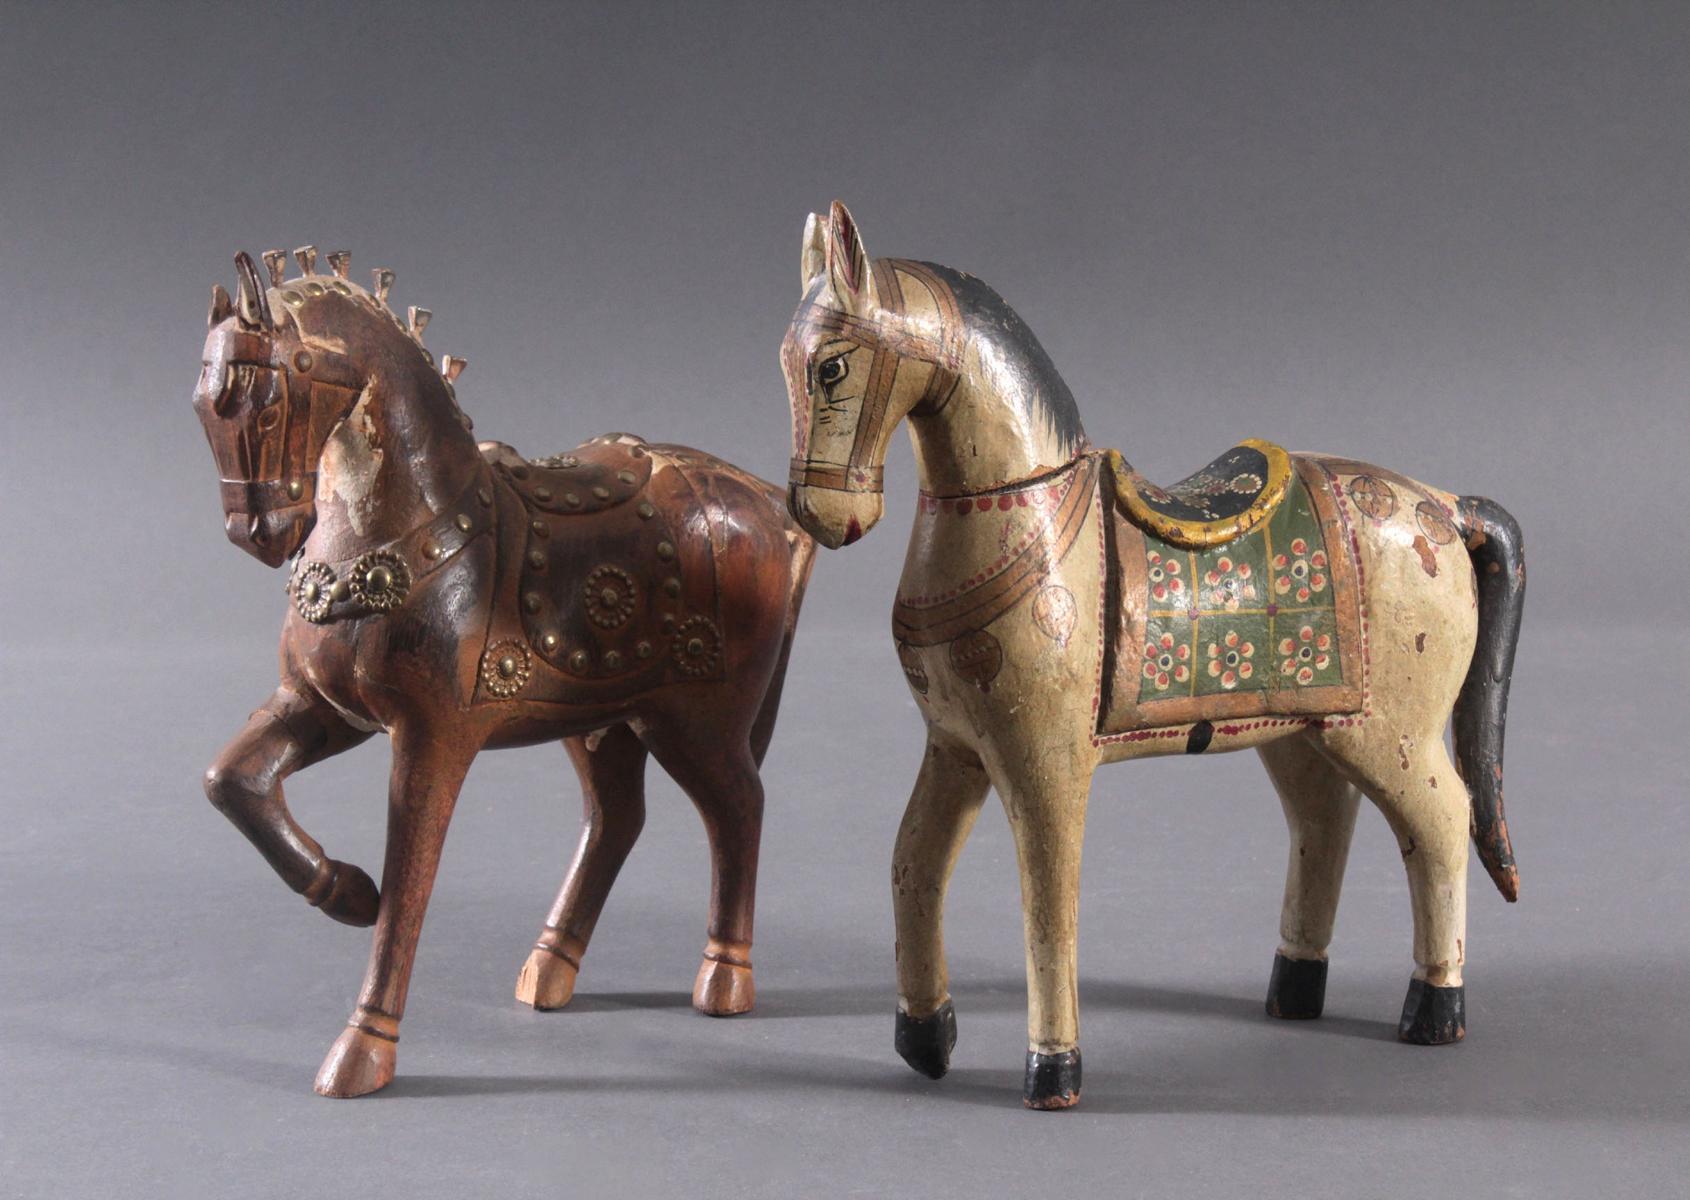 2 Pferdeskulpturen aus Holz 1. Hälfte 20. Jh.-2